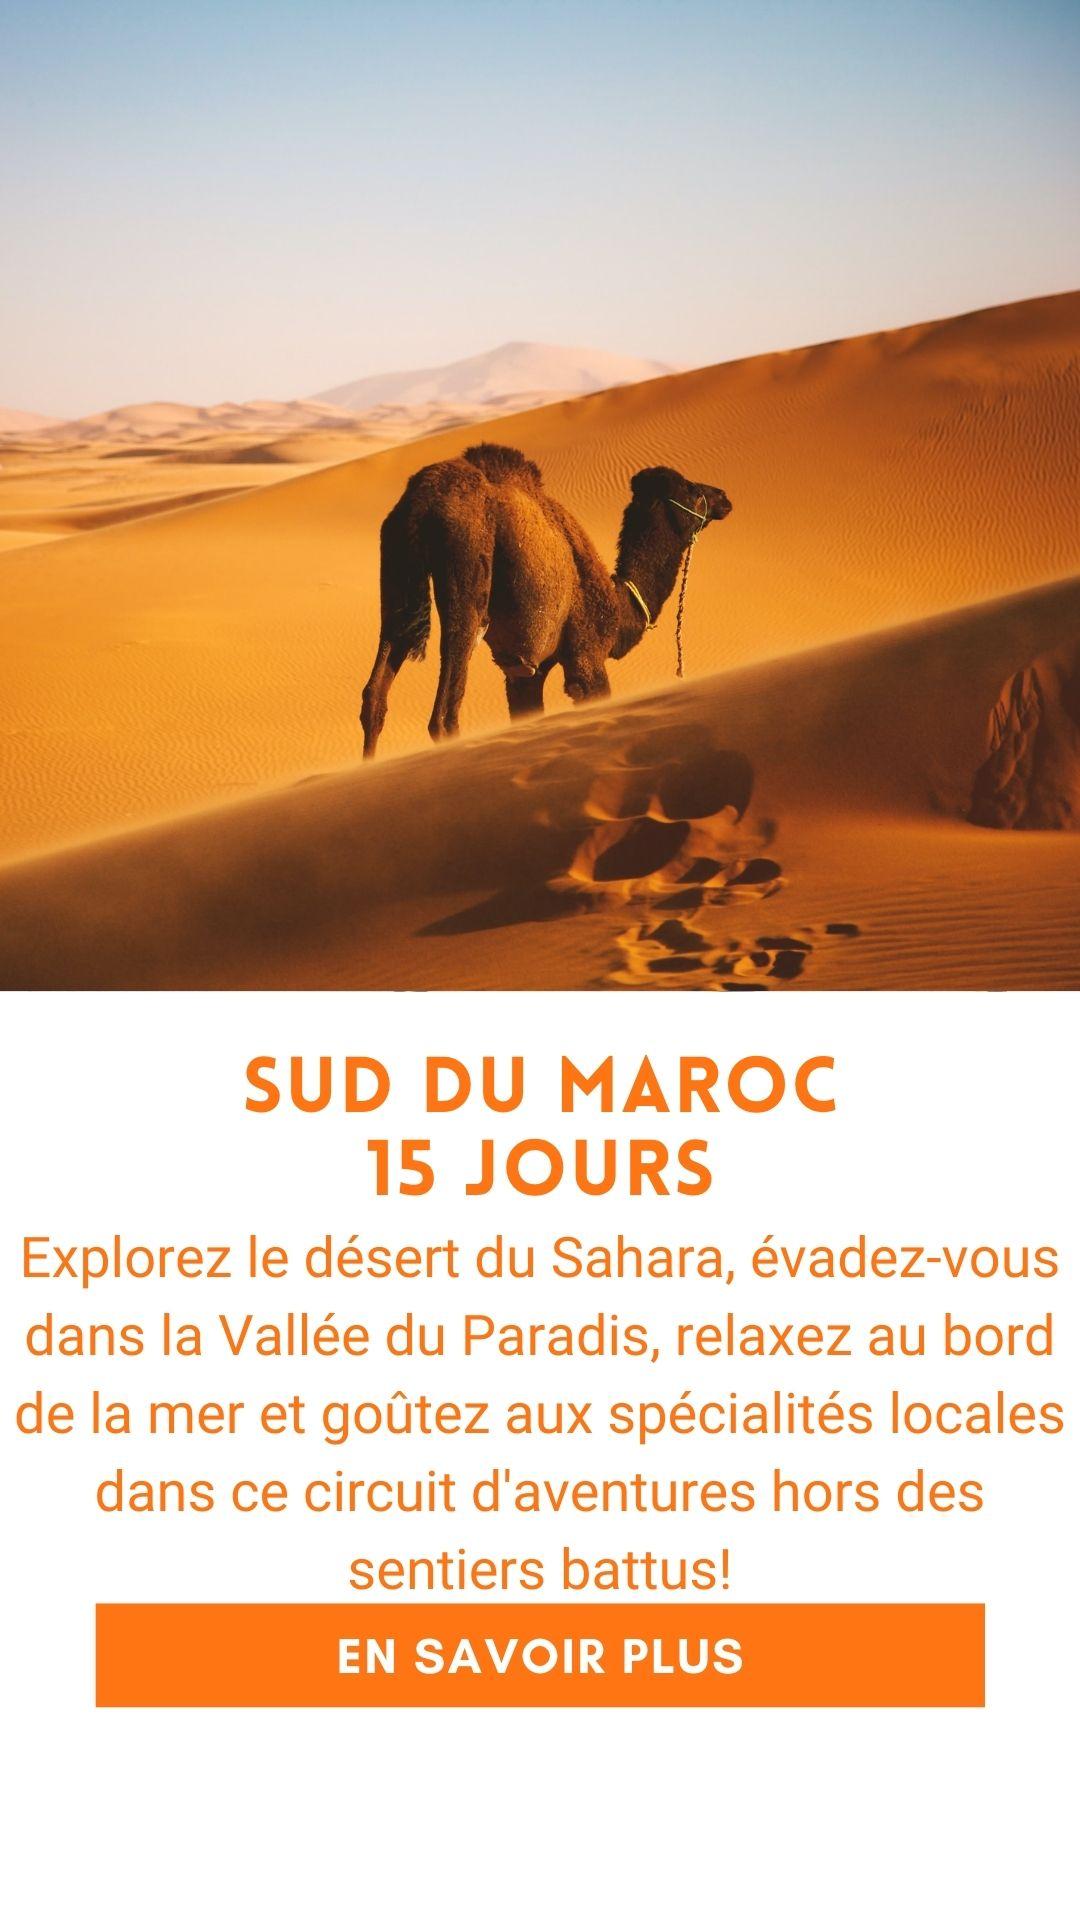 Voyage organisé au Maroc